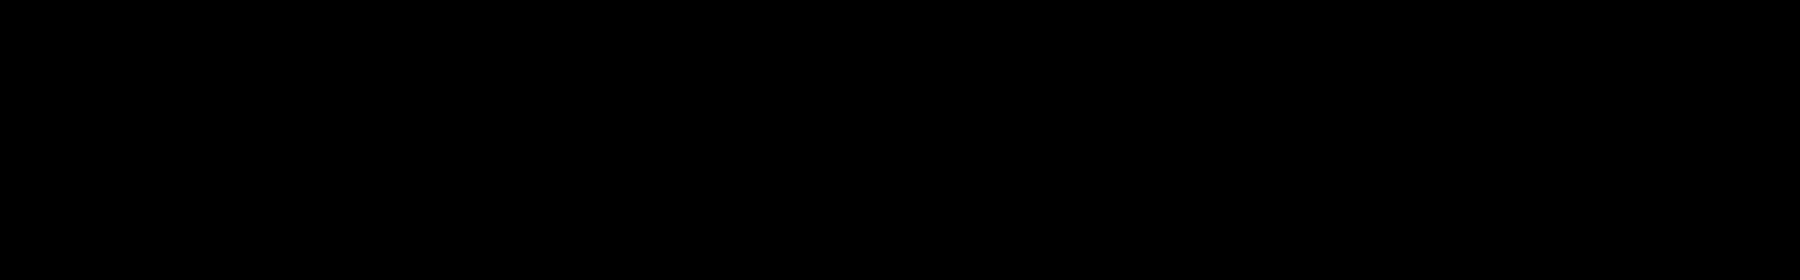 TIMECODE audio waveform